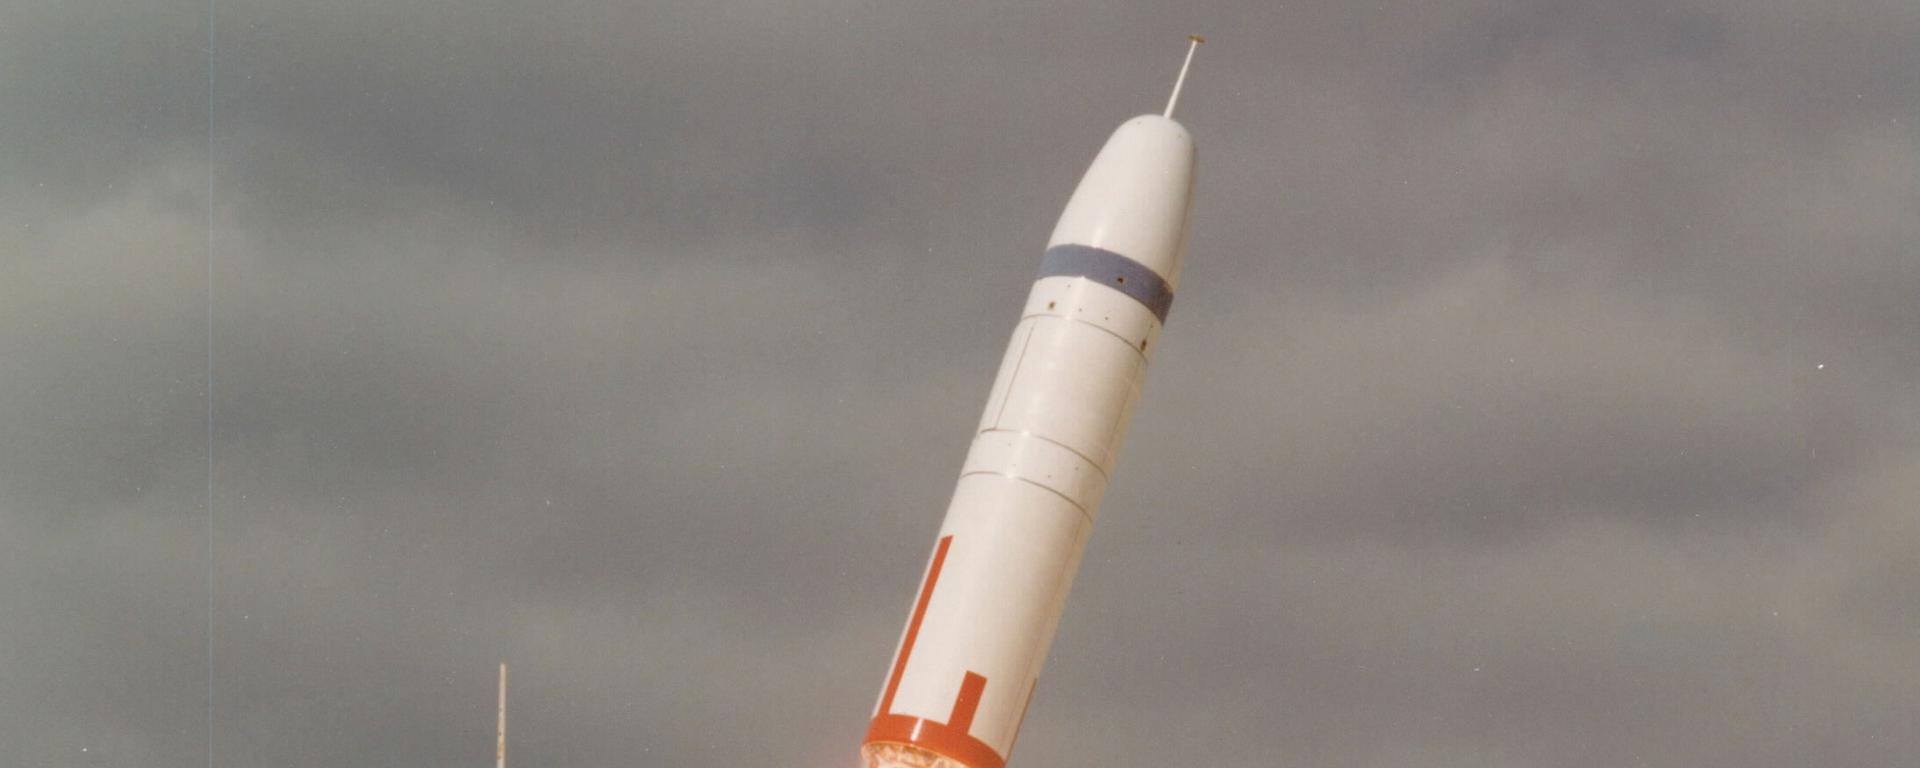 Primer lanzamiento del misil Trident C4  - Sputnik Mundo, 1920, 13.09.2021